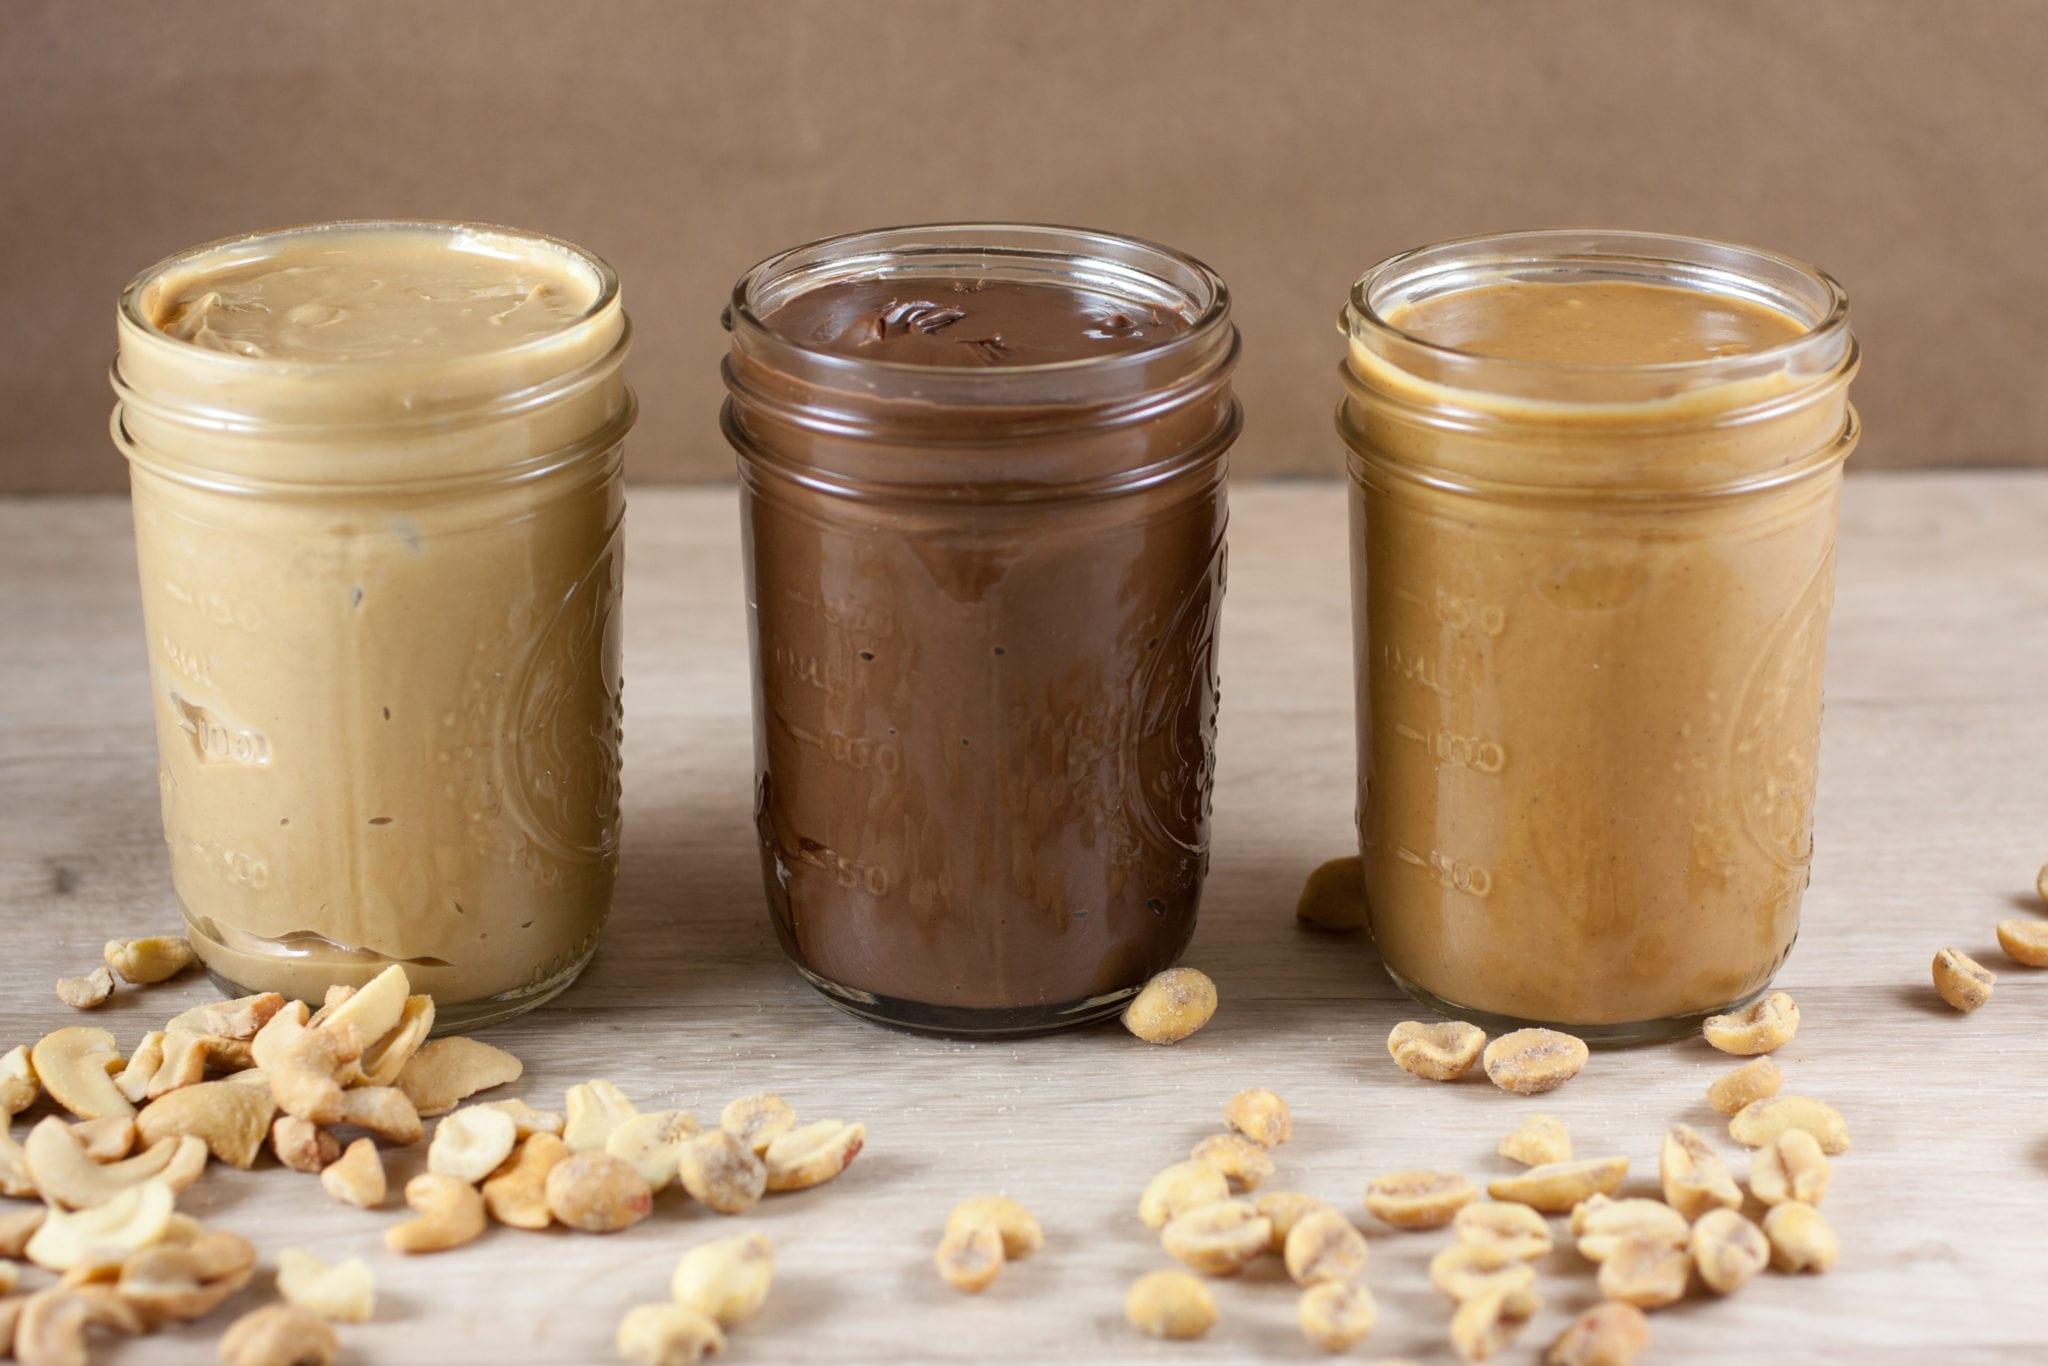 three jars of nut butter